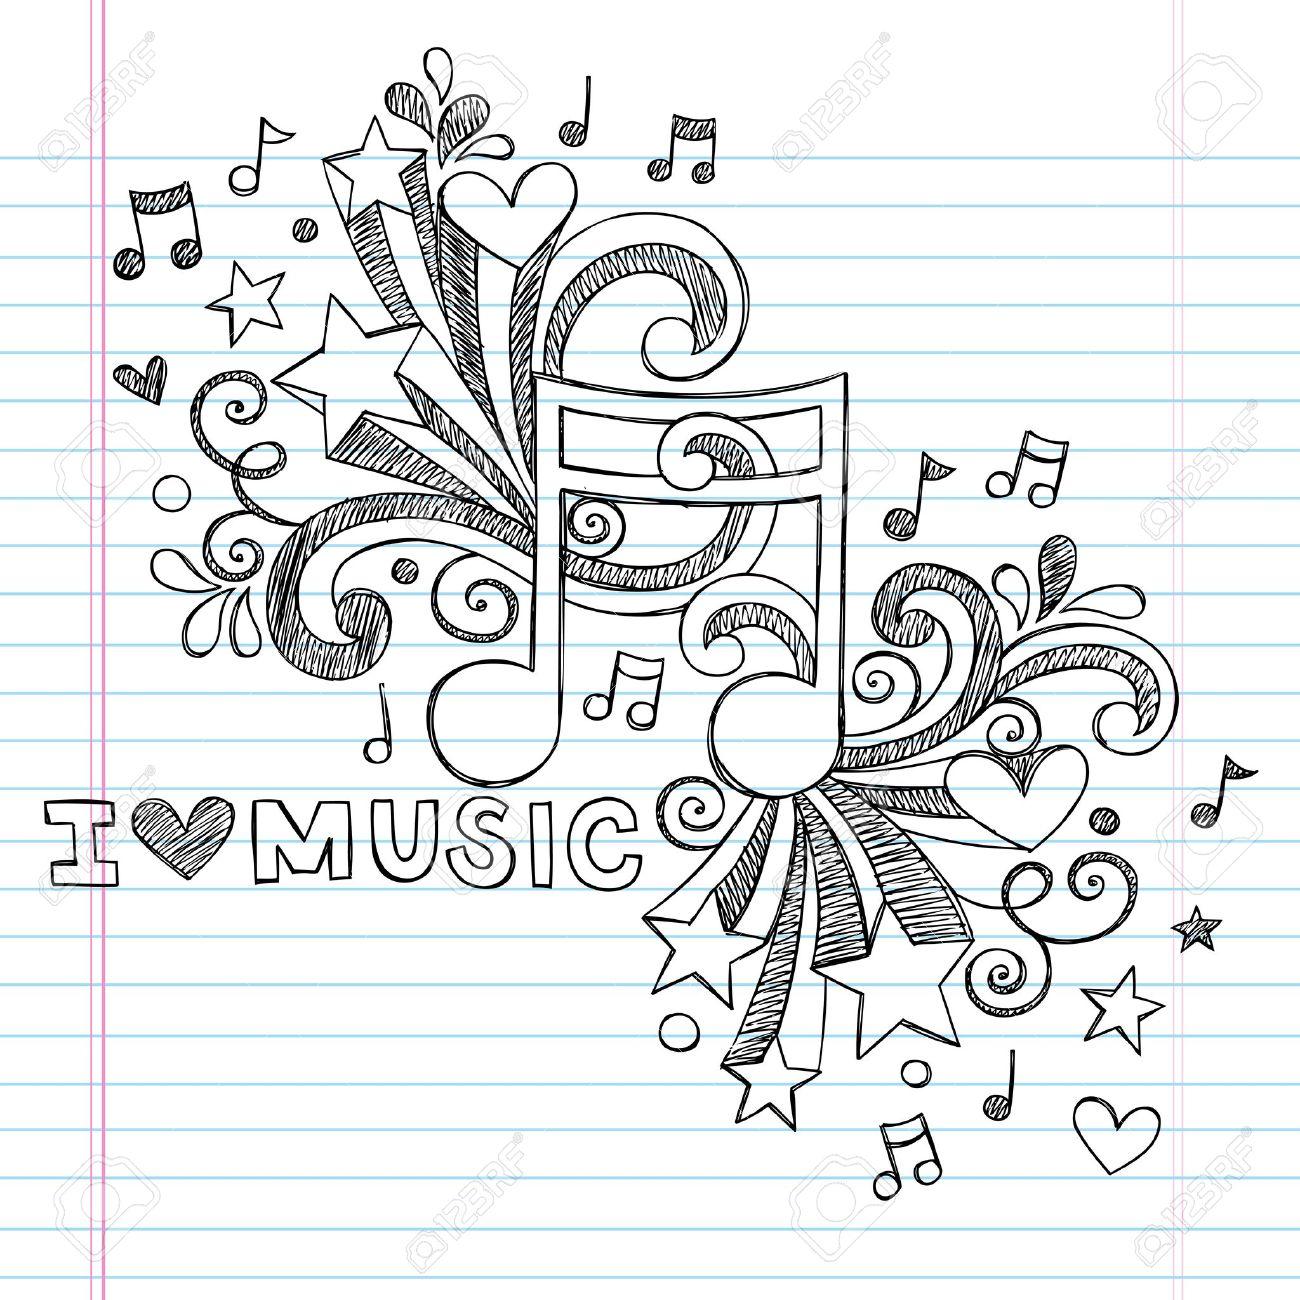 Music Note I Love Music Back to School Sketchy Notebook Doodles- Hand-Drawn Illustration Design Elements on Lined Sketchbook Paper Background Stock Vector - 19090357